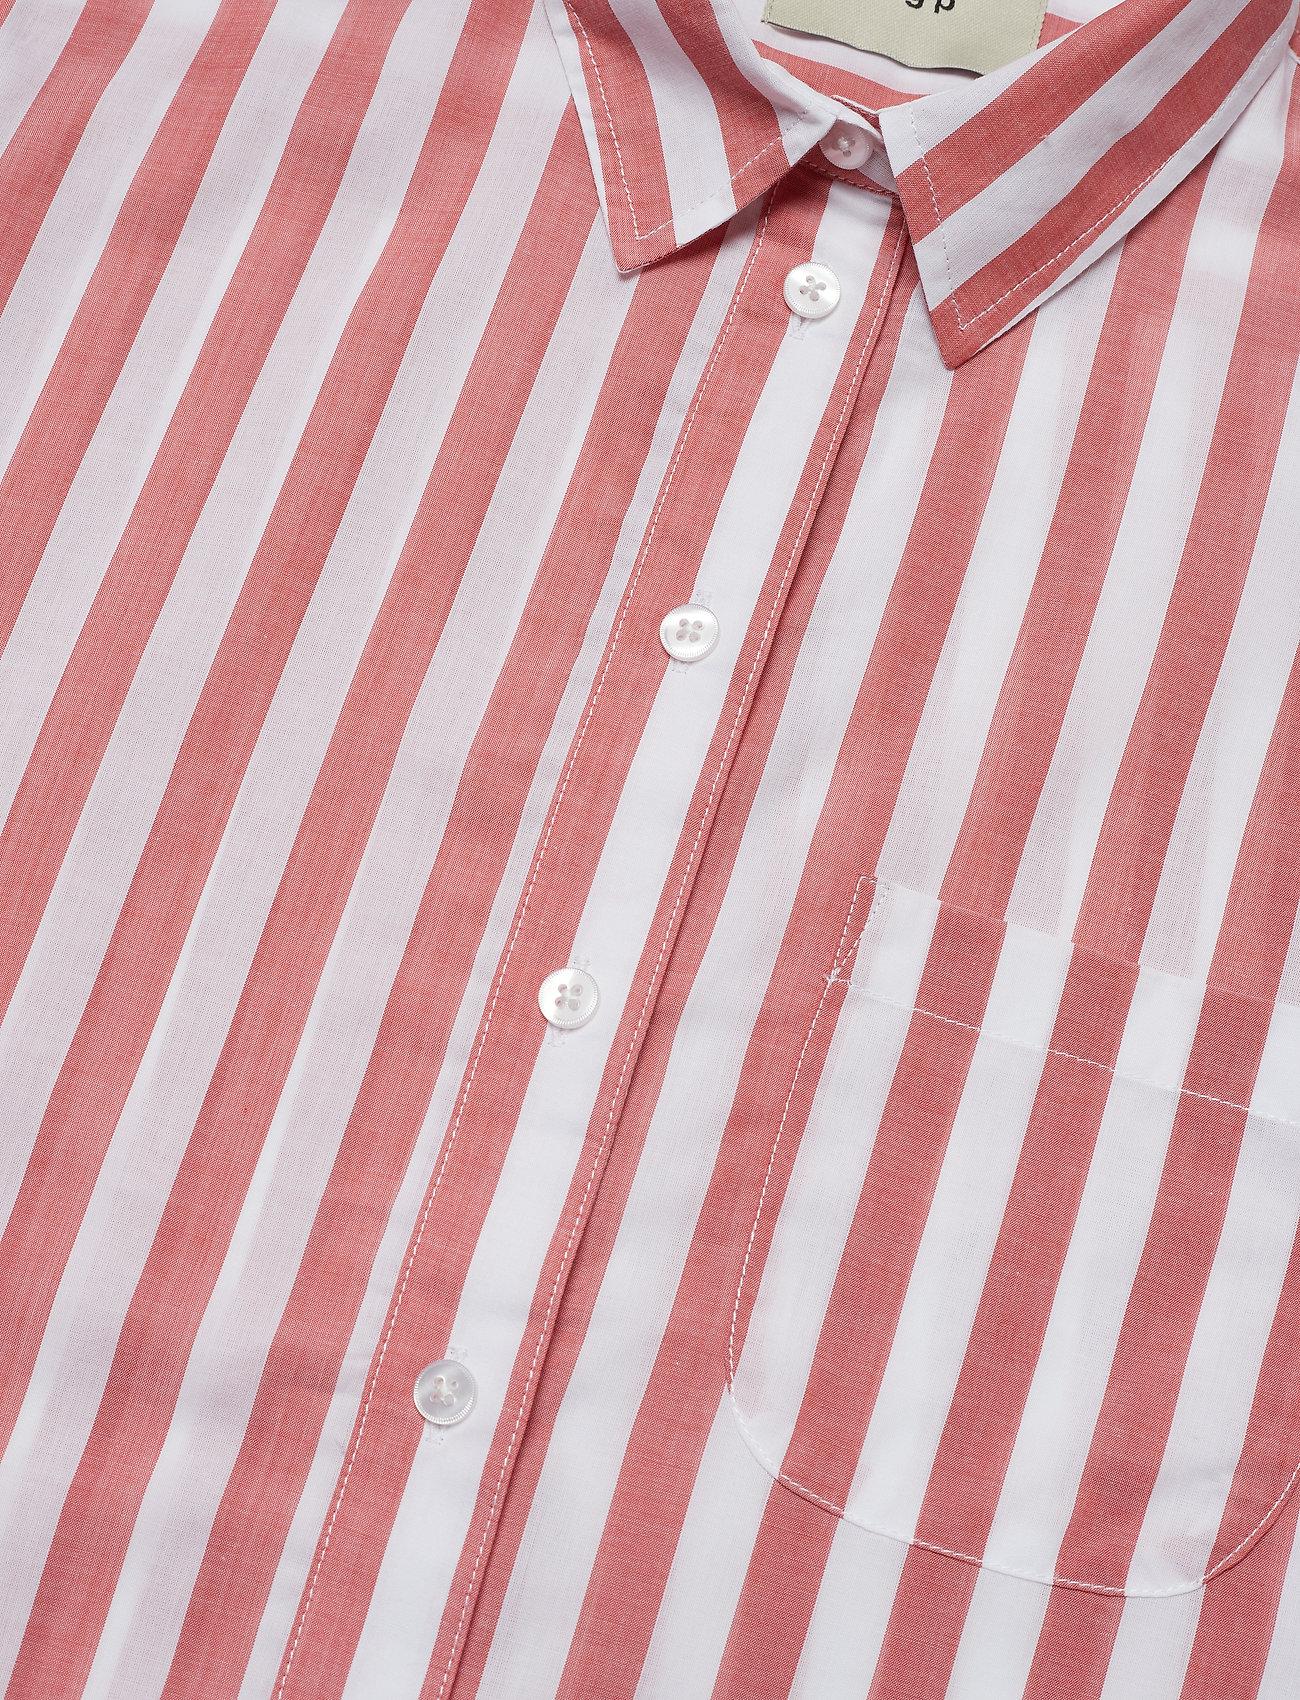 Stig P Felixa - Blusar & Skjortor Red/ White